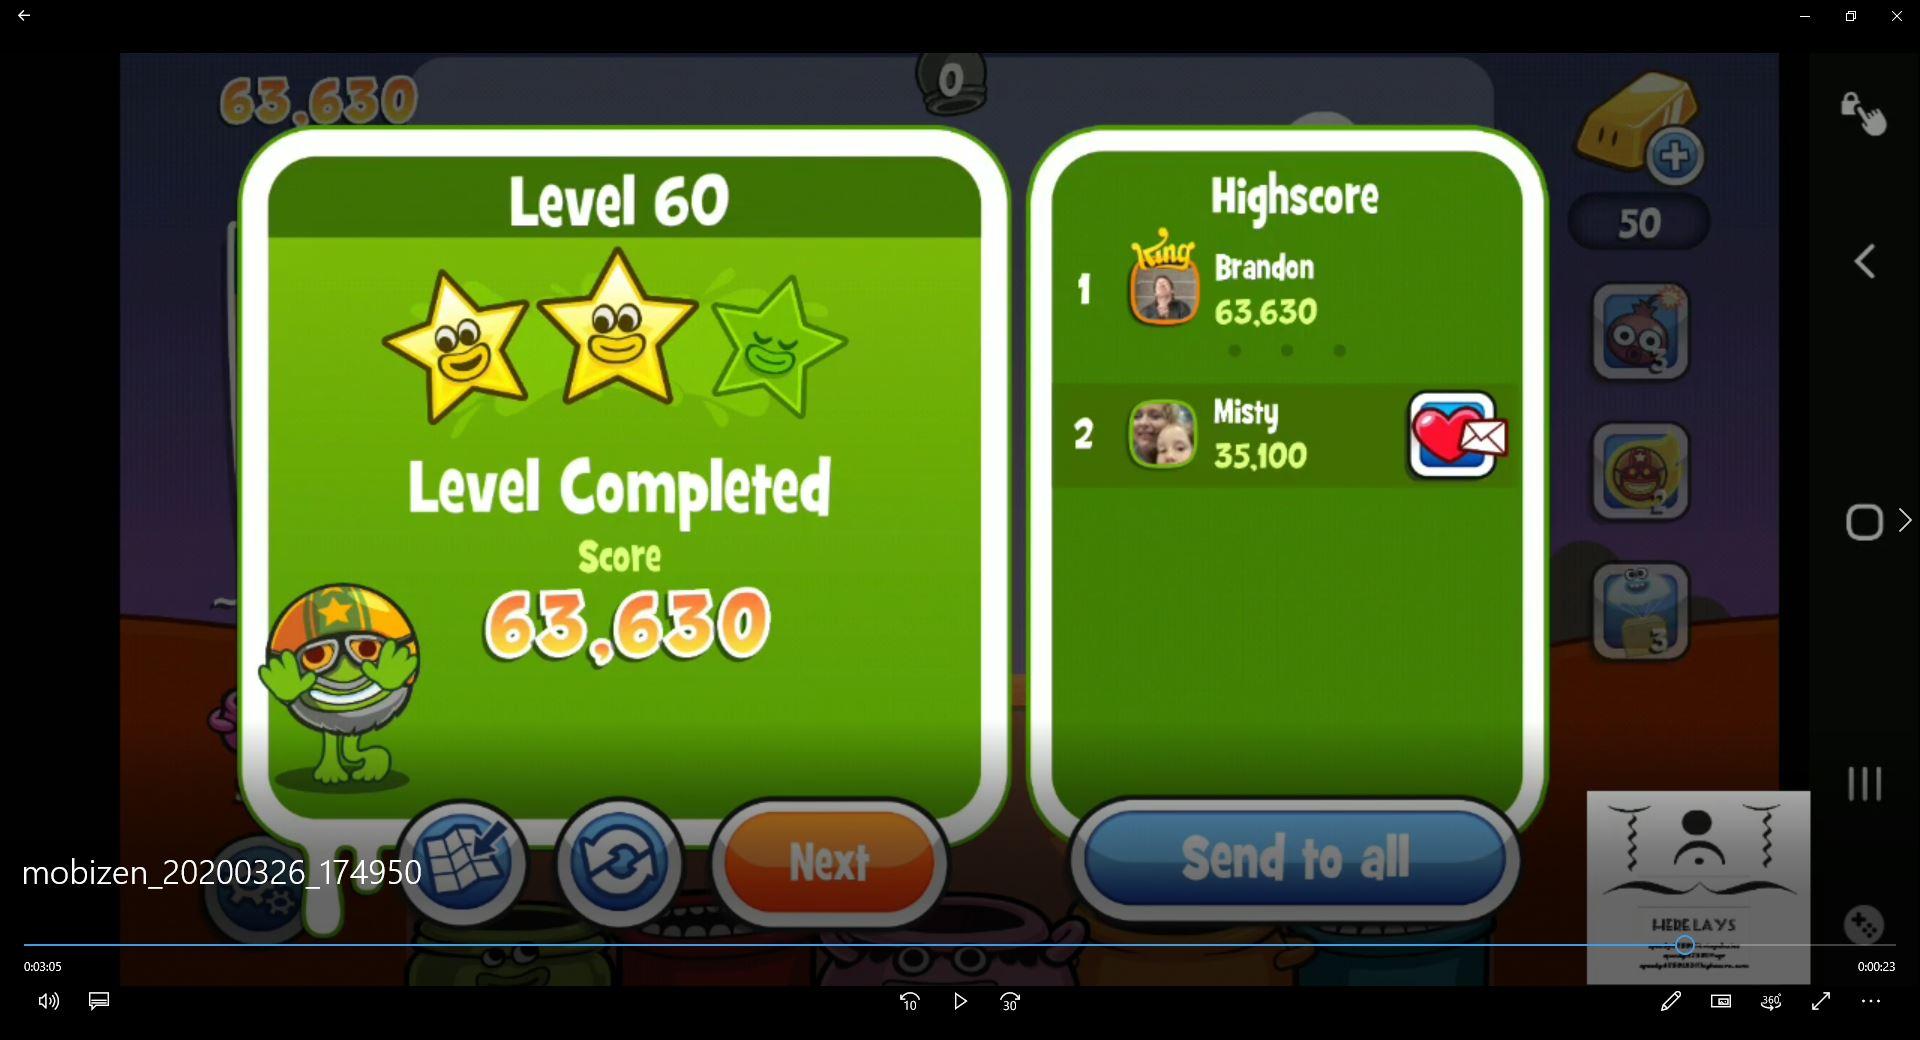 speedy4759123: Papa Pear Saga: Level 060 (Android) 63,630 points on 2020-04-07 15:52:16